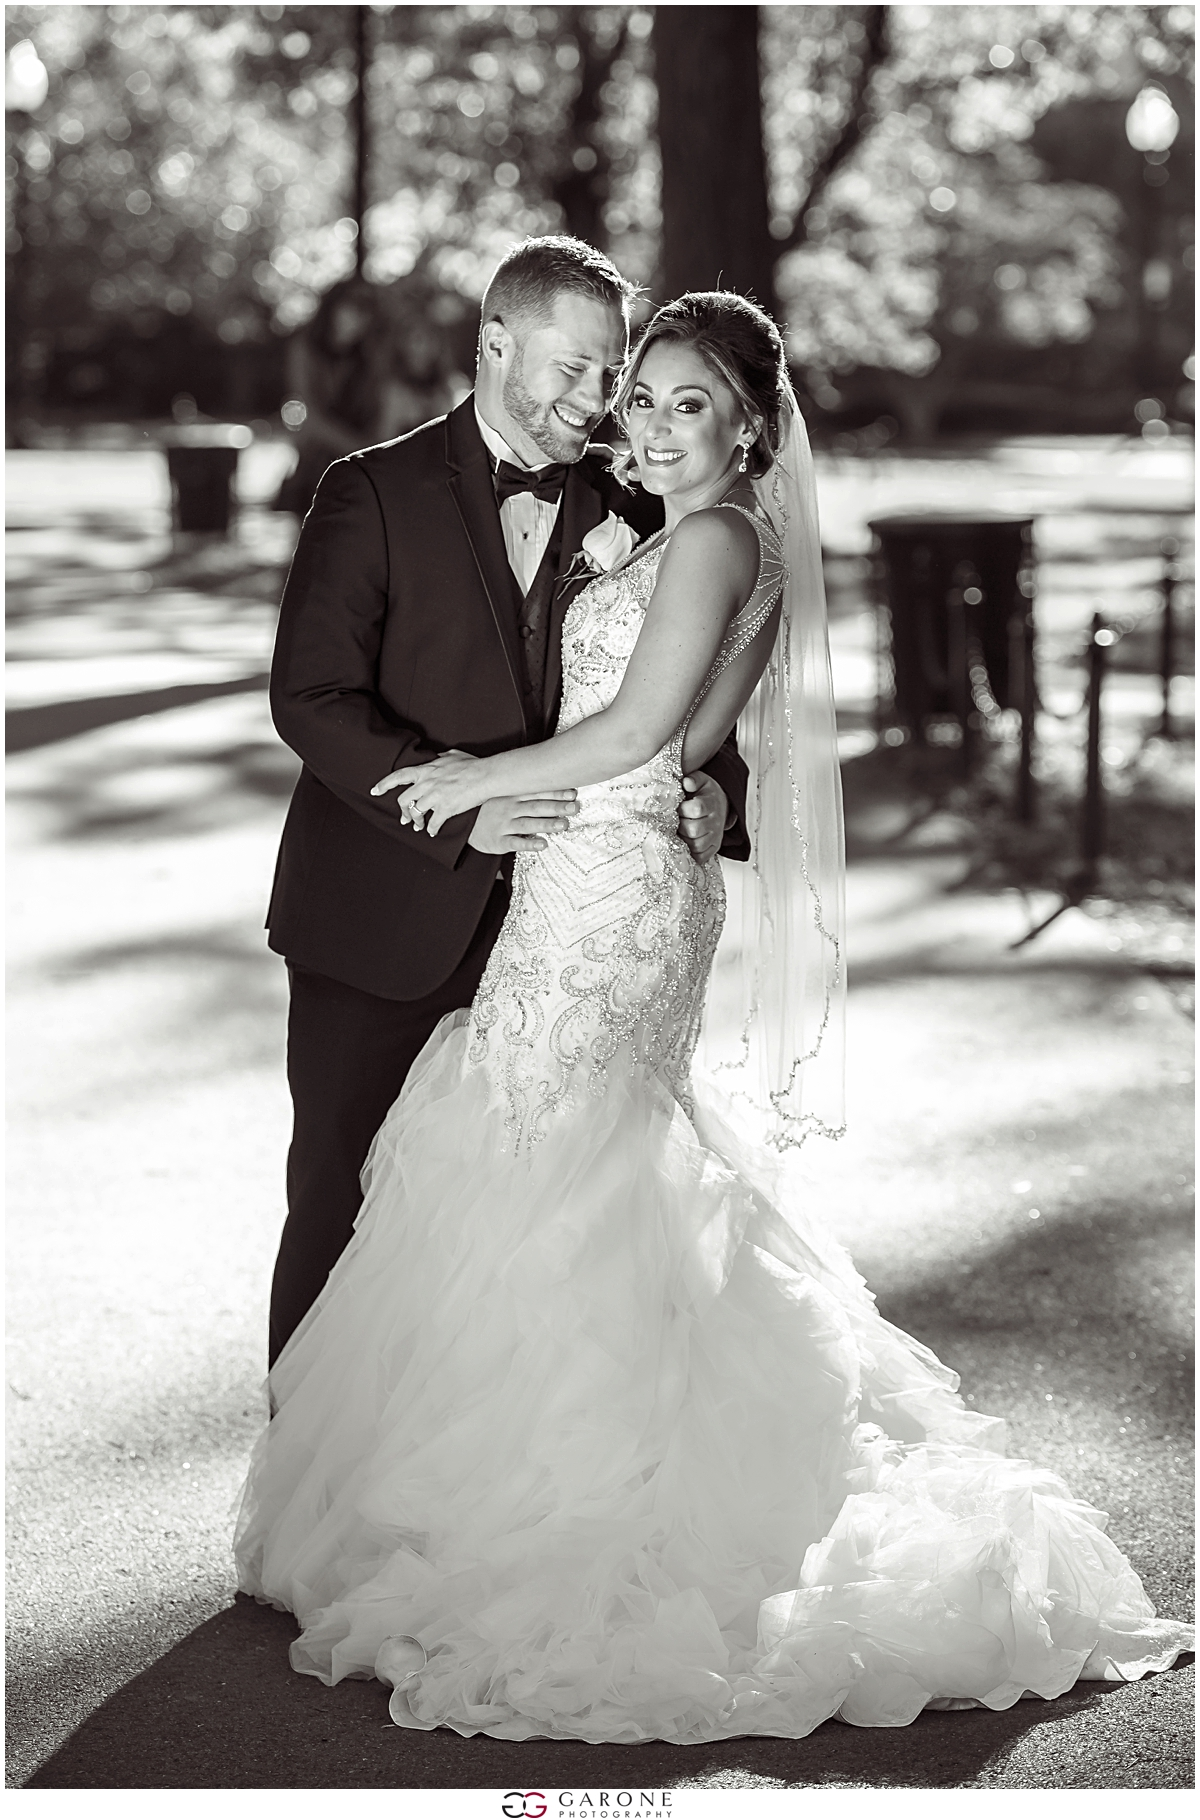 Erika_Eric_THe_State_Room_Boston_Wedding_Photography_Garone_Photography_Boston_Wedding_Photography_0014.jpg